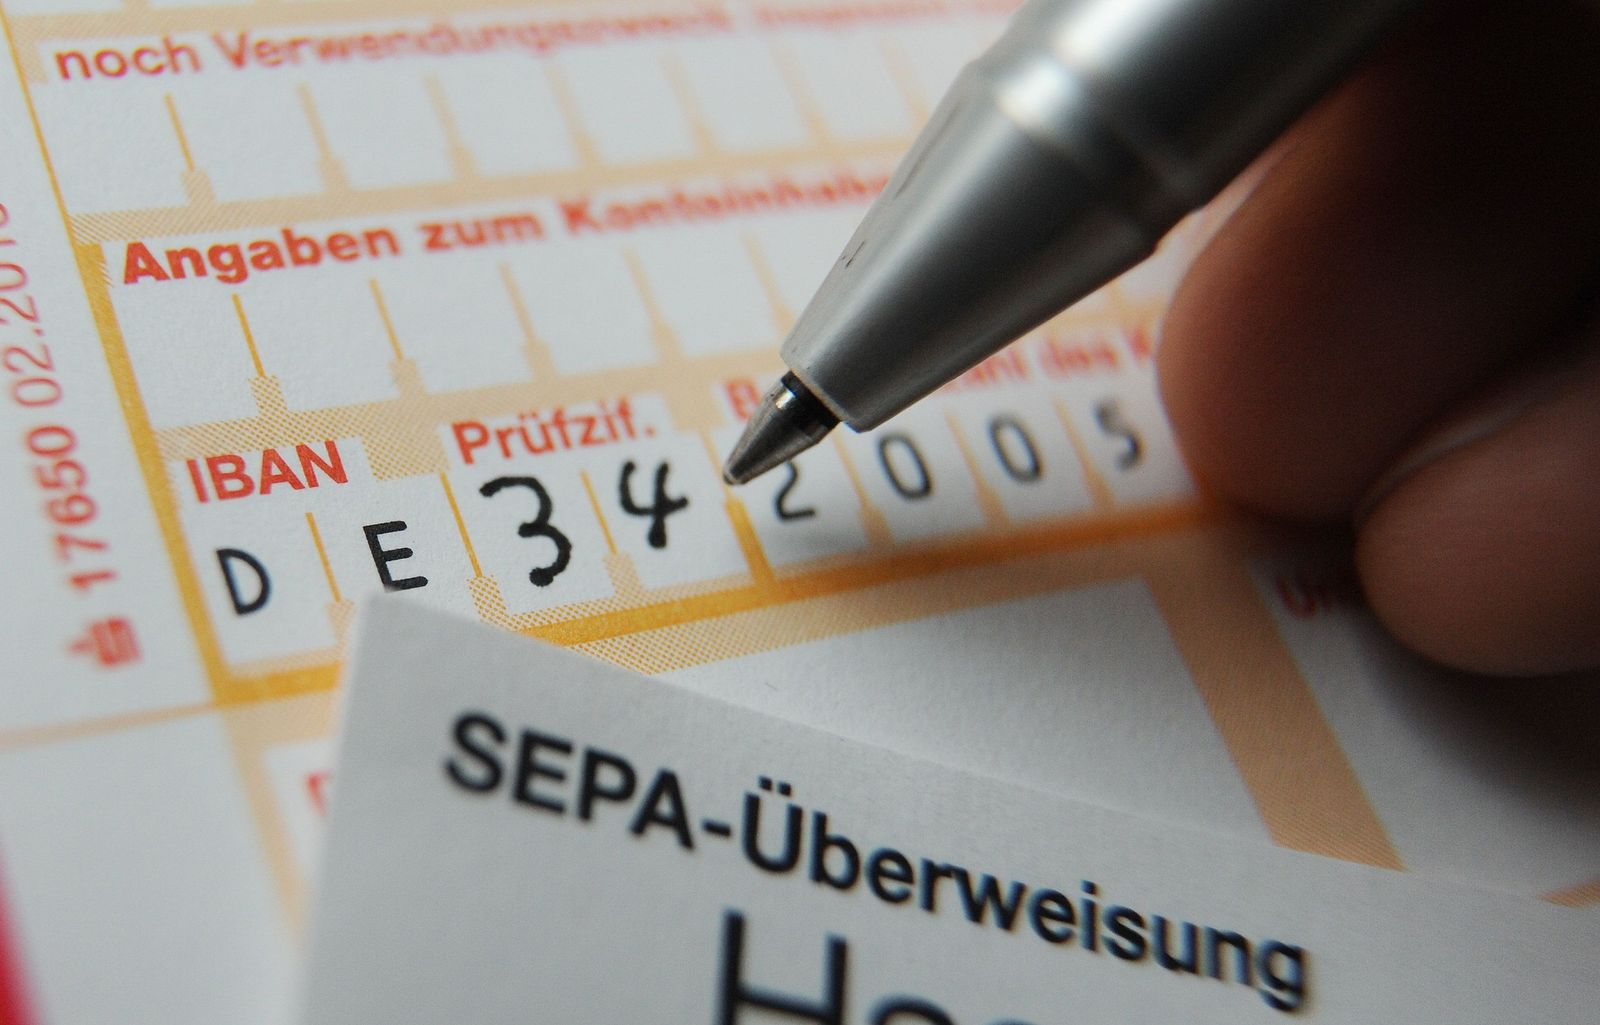 SEPA-Überweisungsträger